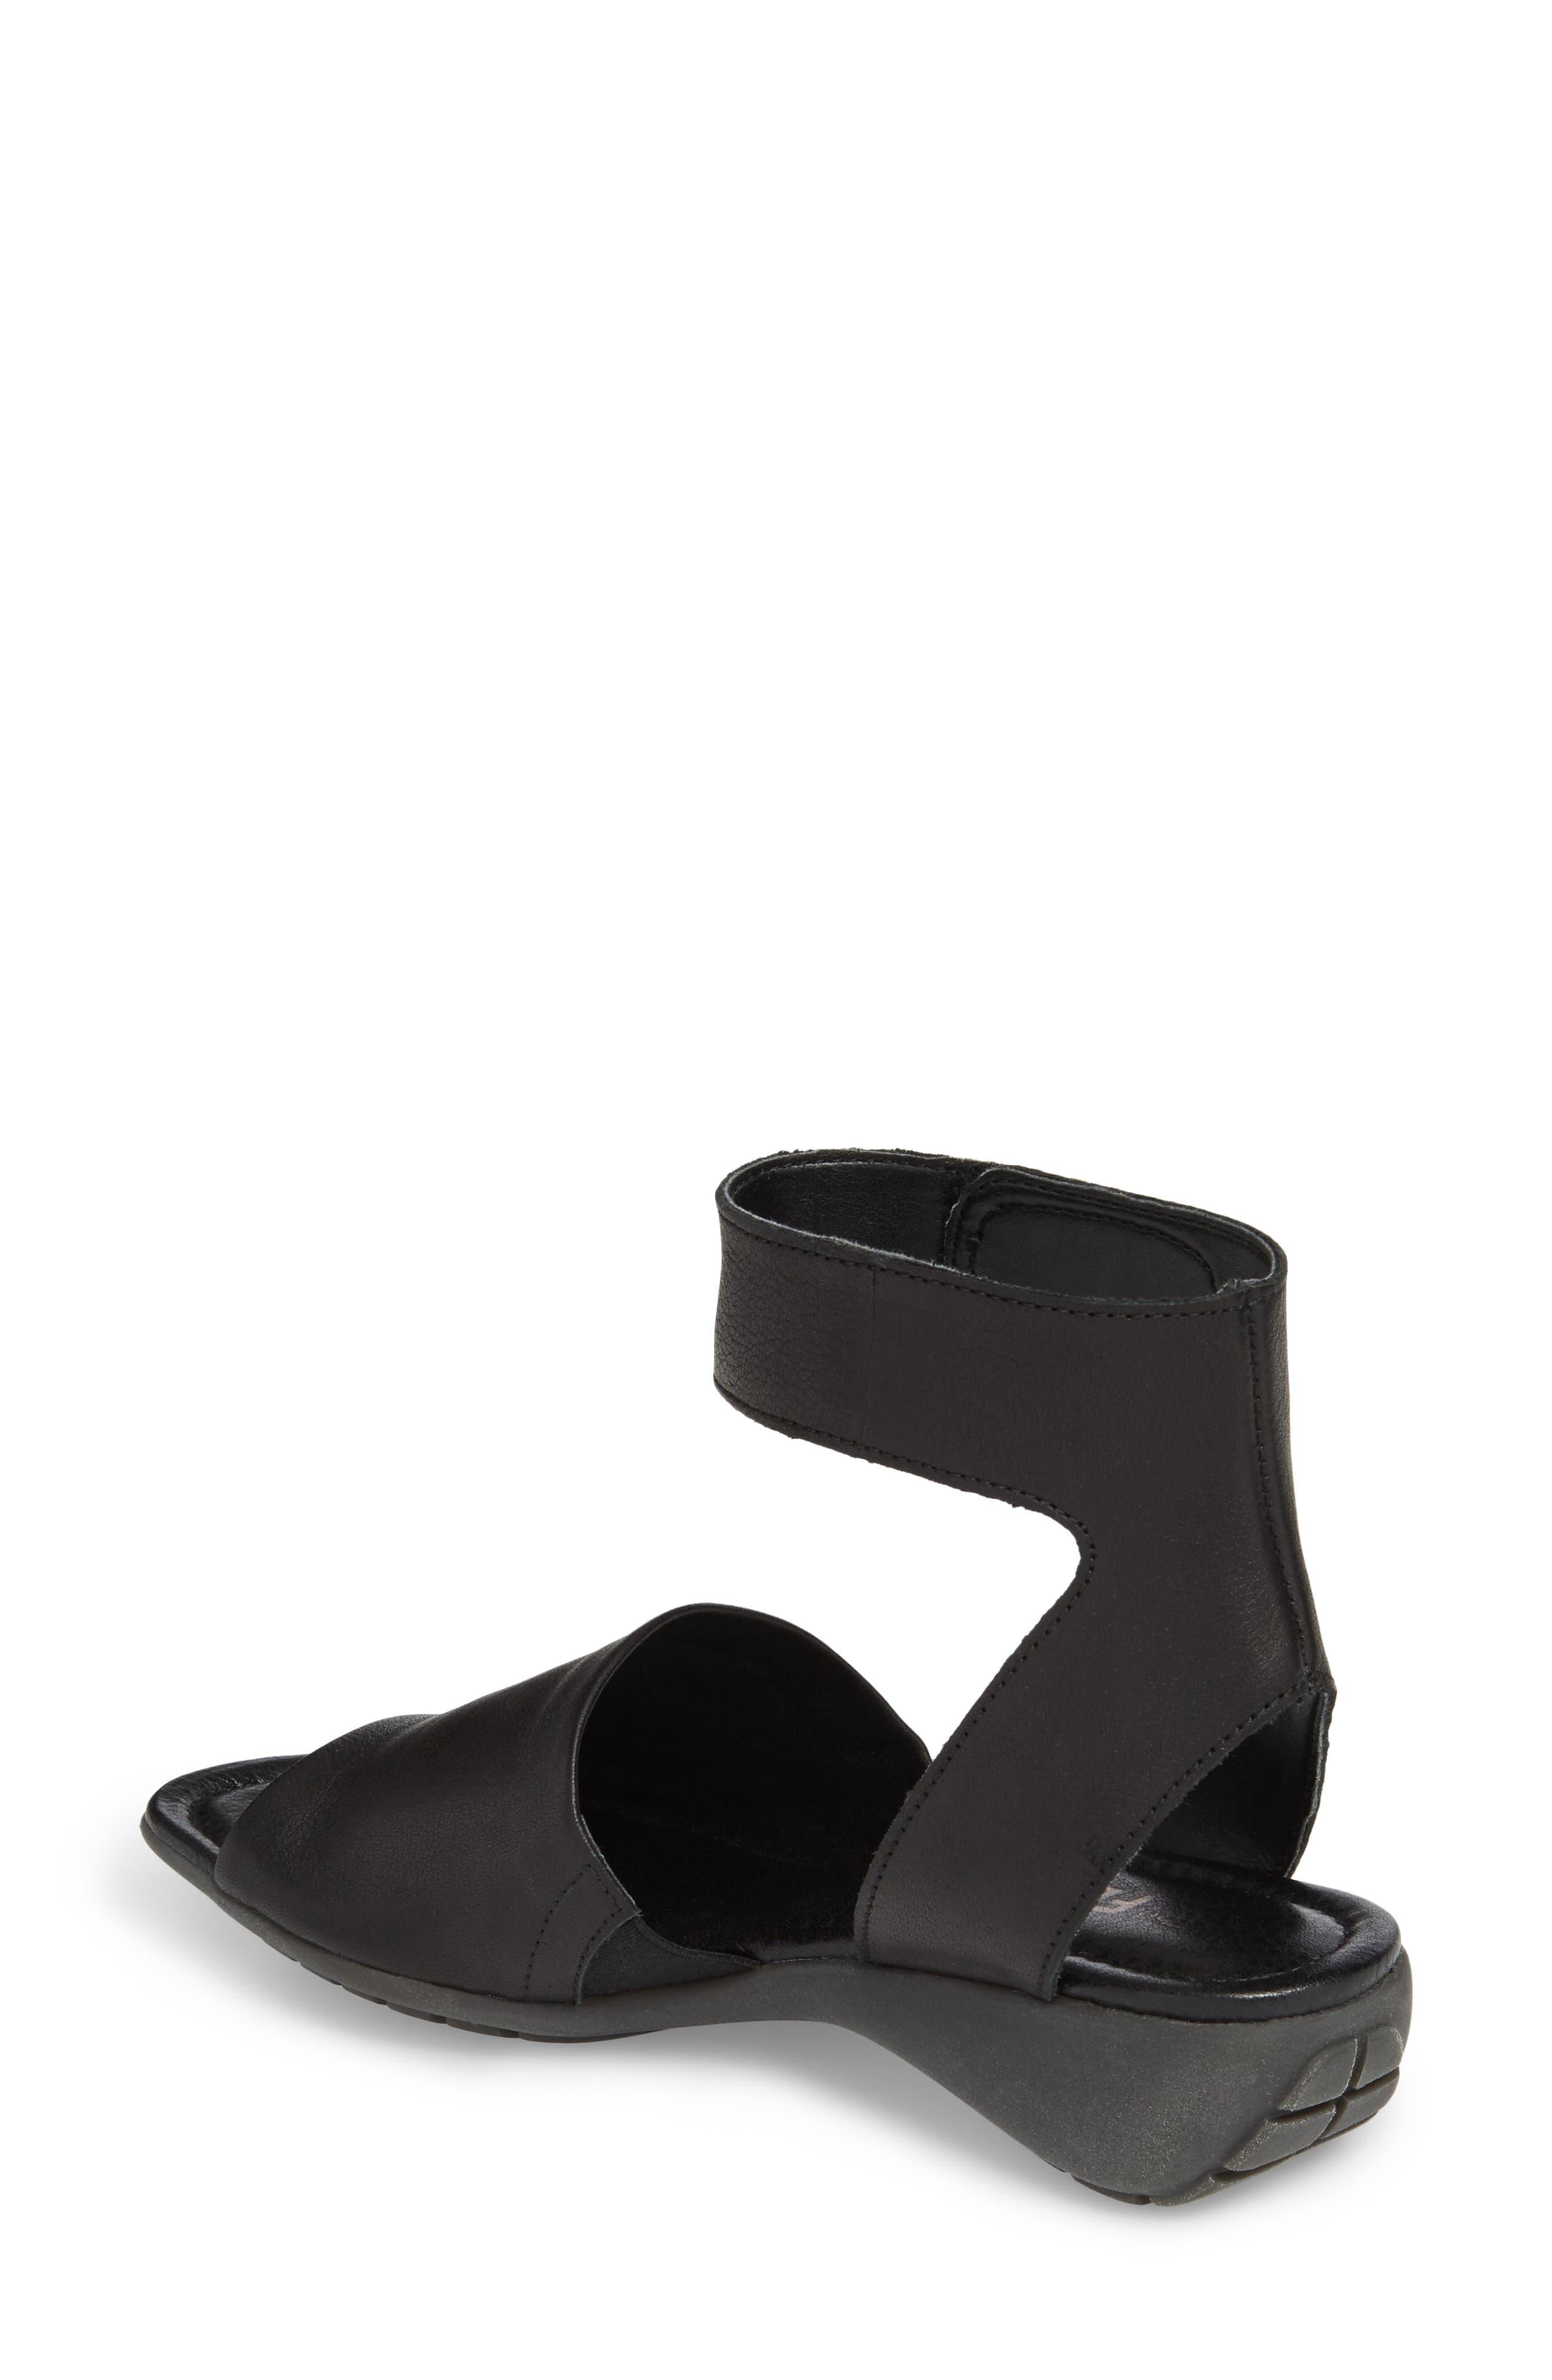 'Beglad' Leather Ankle Strap Sandal,                             Alternate thumbnail 2, color,                             Black Vachetta Leather